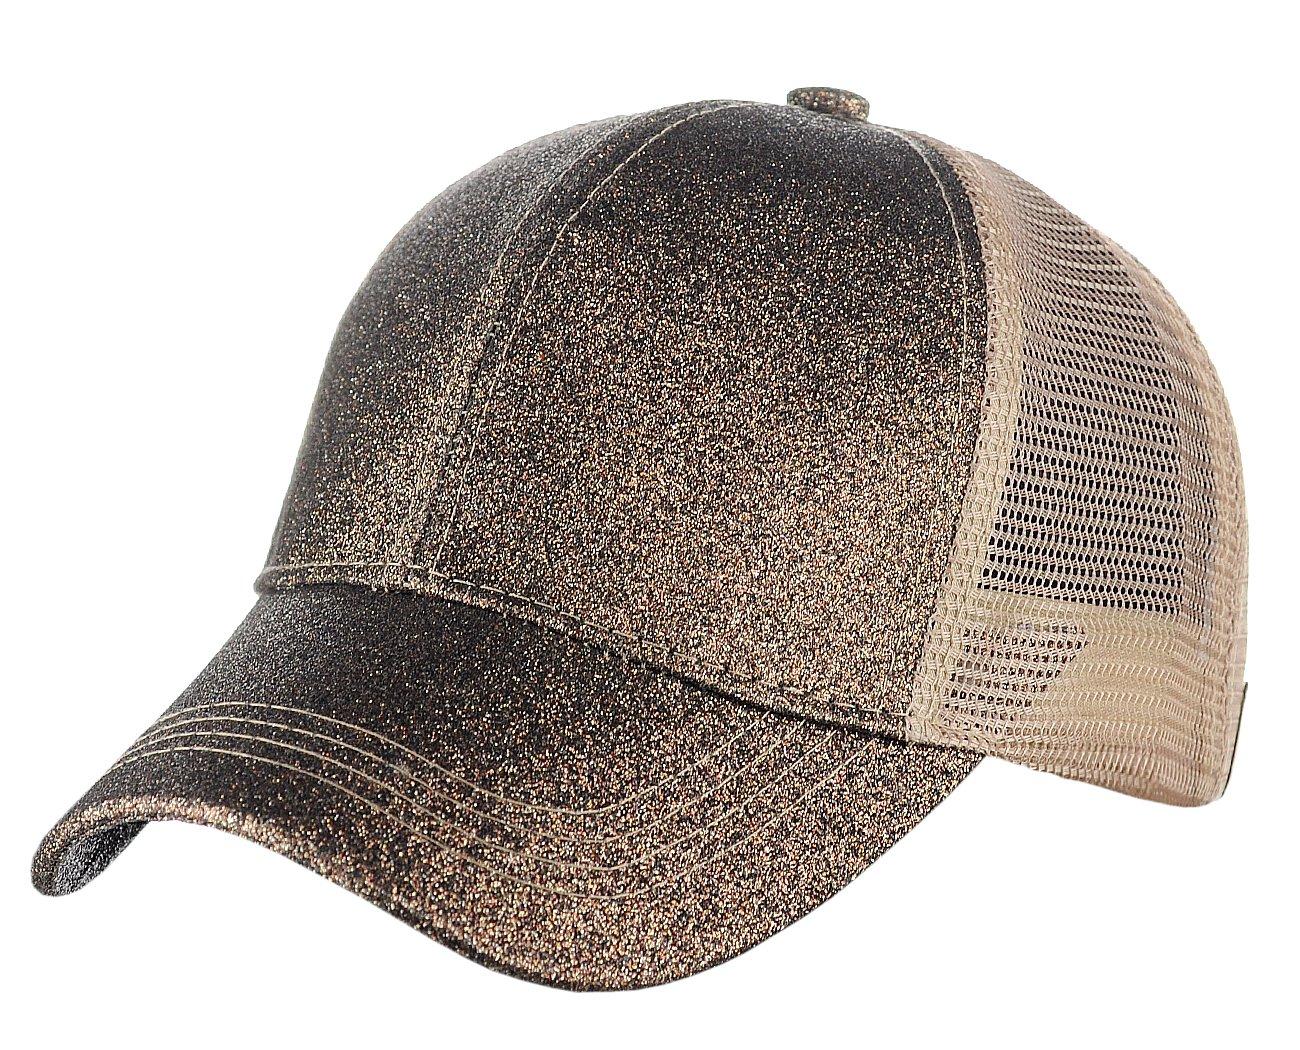 3c2b6da86 C.C Ponycap Messy High Bun Ponytail Adjustable Glitter Mesh Trucker Baseball  Cap, Smoky Topaz - BT6-SMOKY TOPAZ < Baseball Caps < Clothing, Shoes &  Jewelry ...